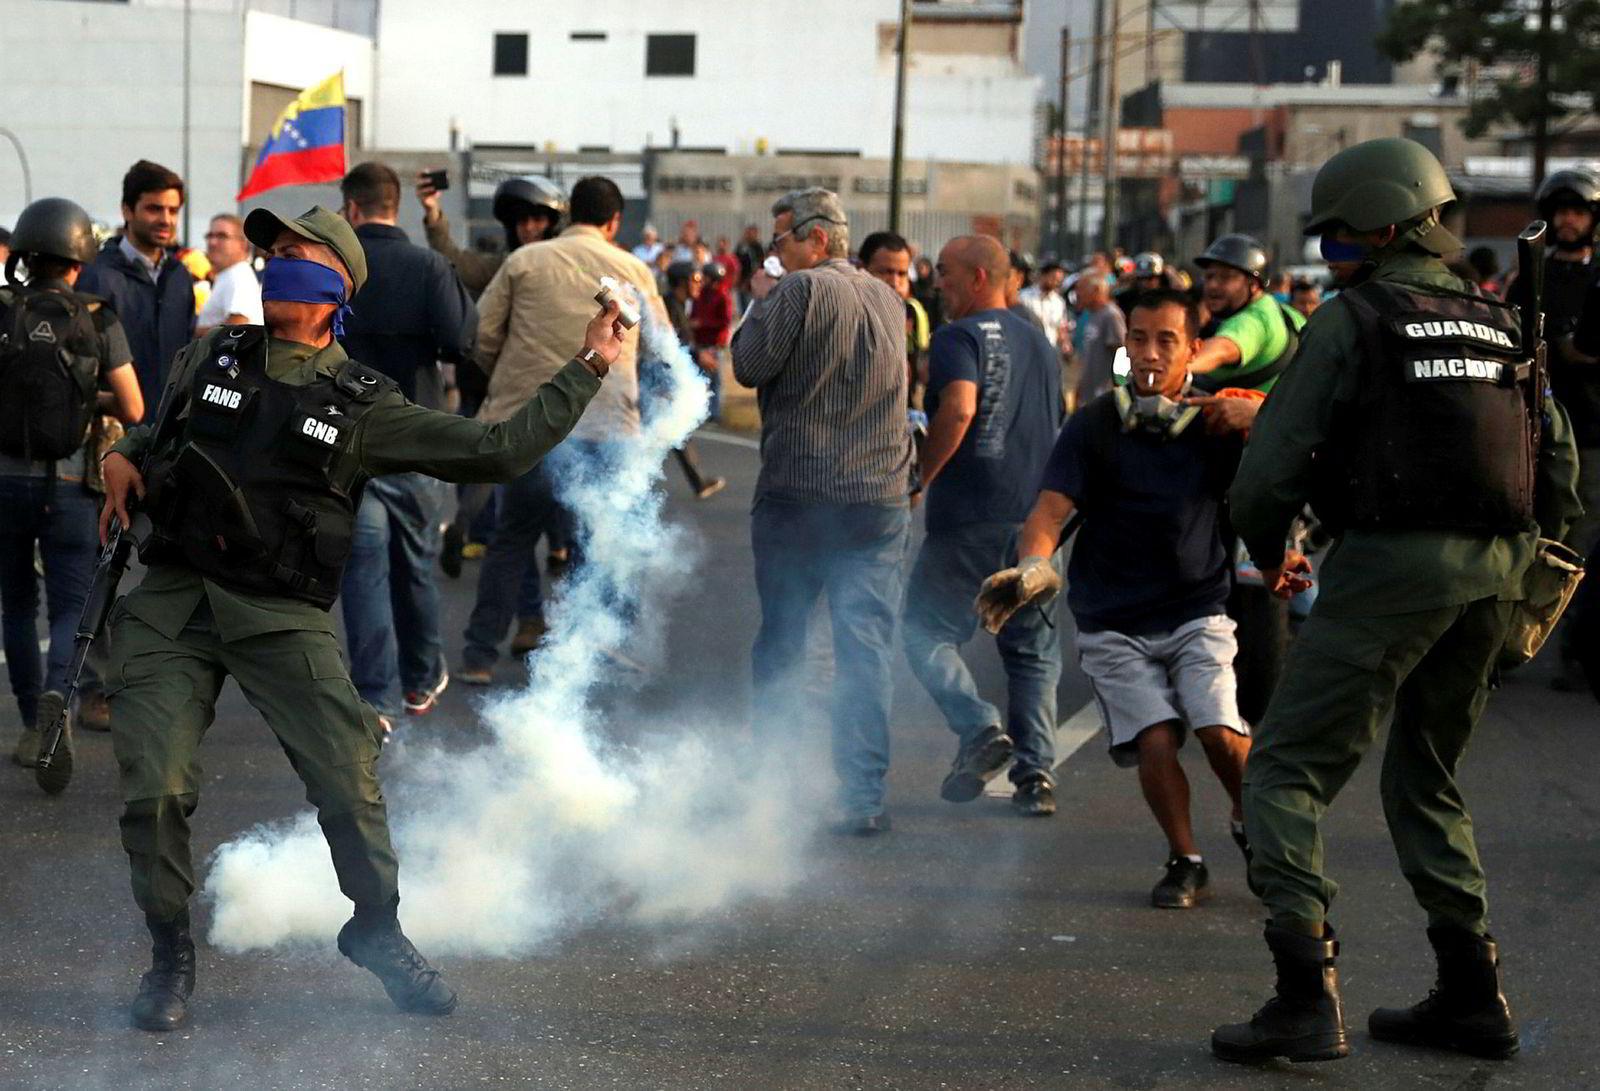 Det er tirsdag nye sammenstøt i Venezuela. Her ved luftbasen Generalísimo Francisco de Miranda ved hovedstaden Caracas.